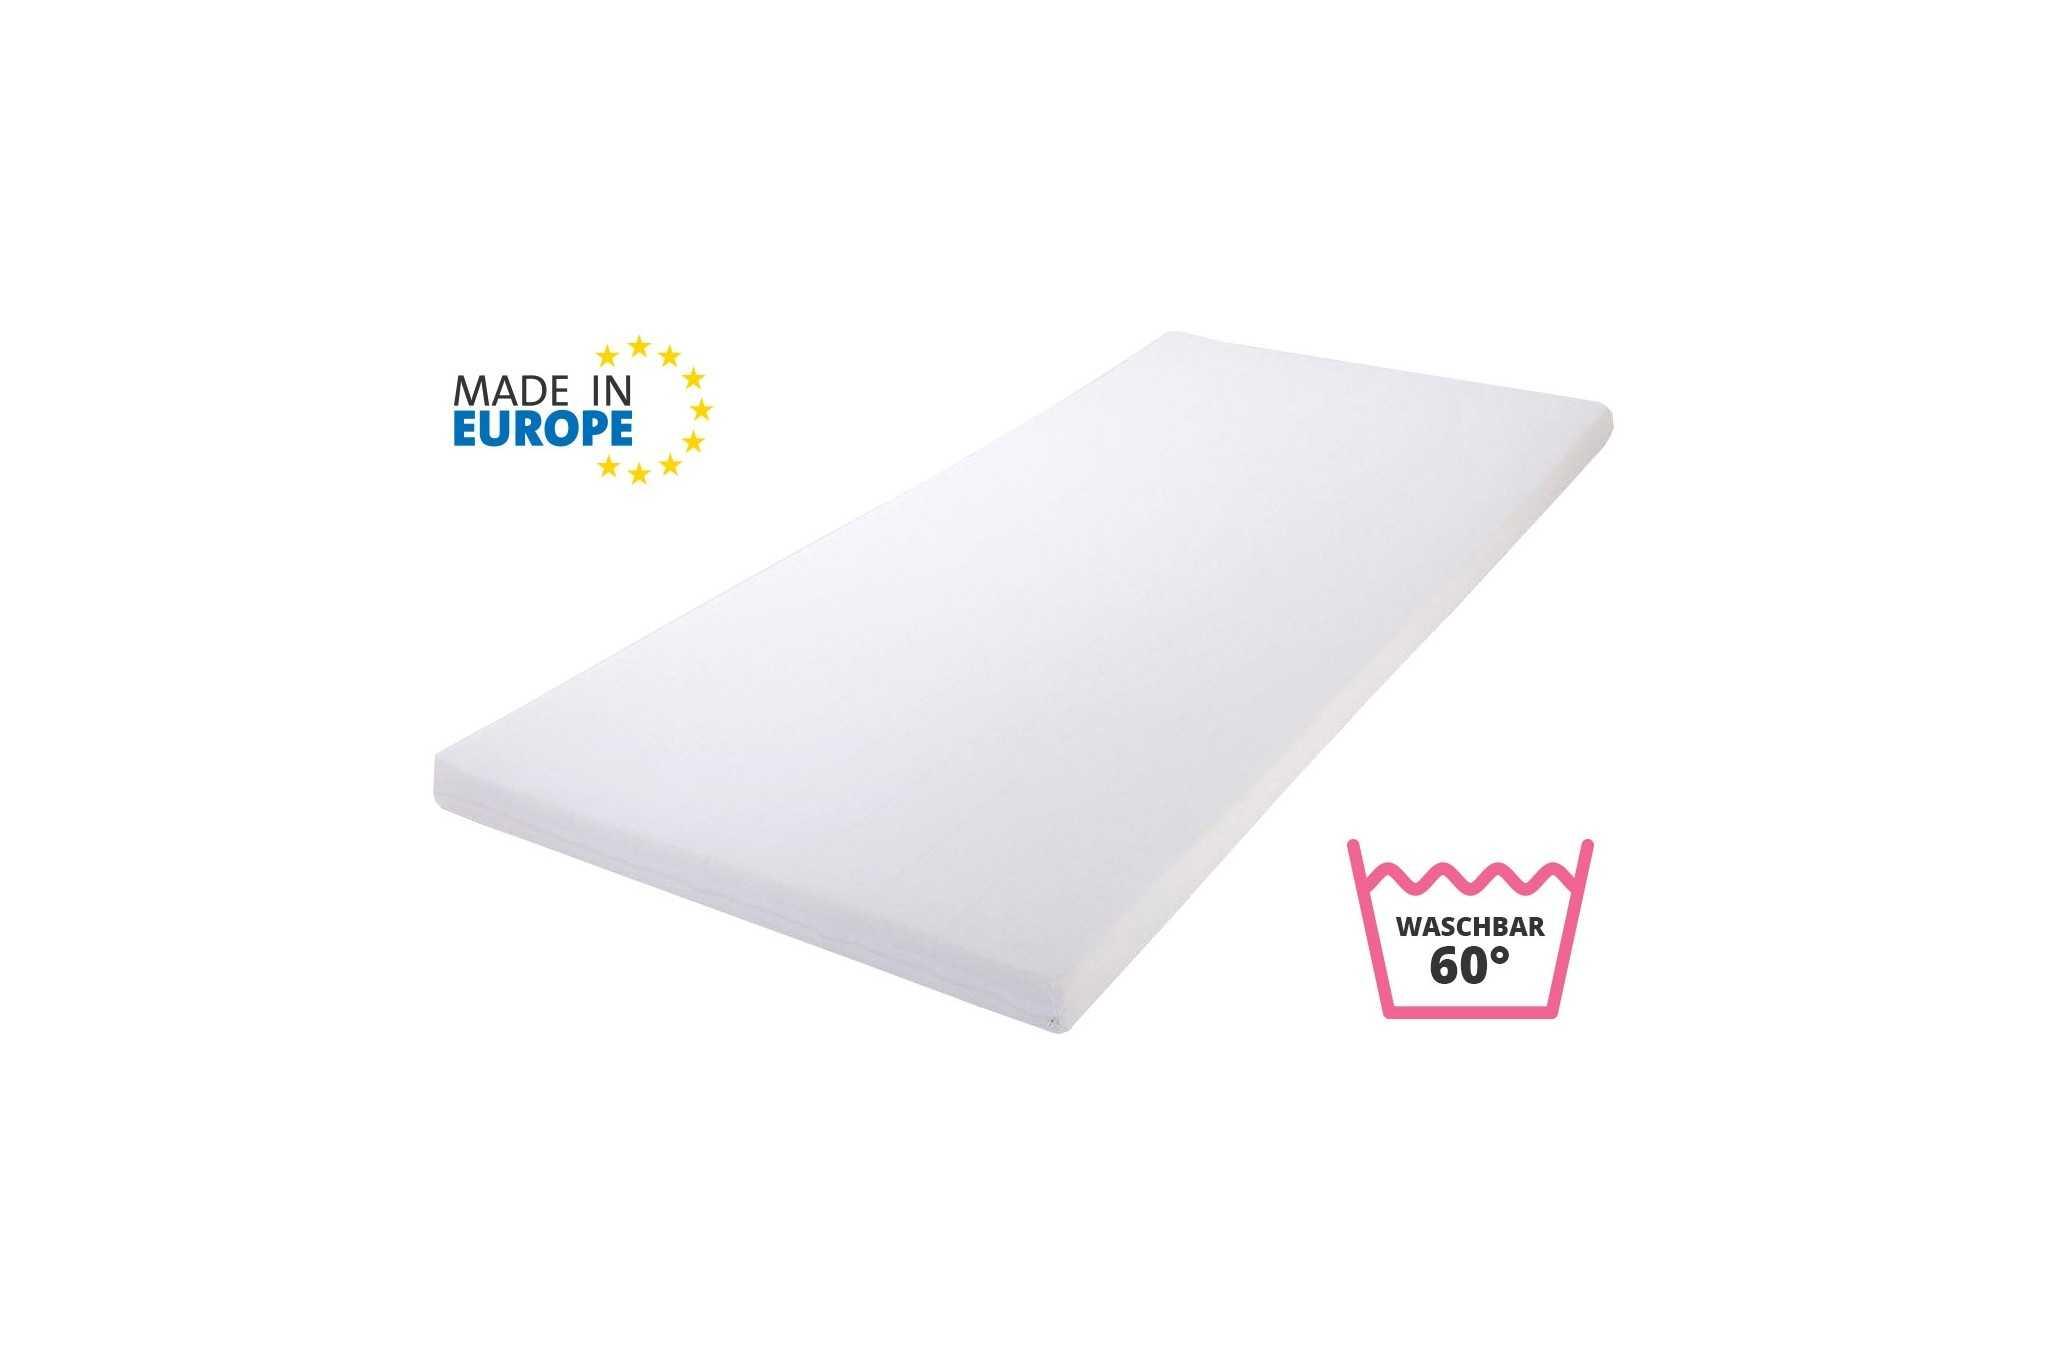 Best For Kids Kinderbettmatratze 70x140 cm Kinder-Rollmatratze